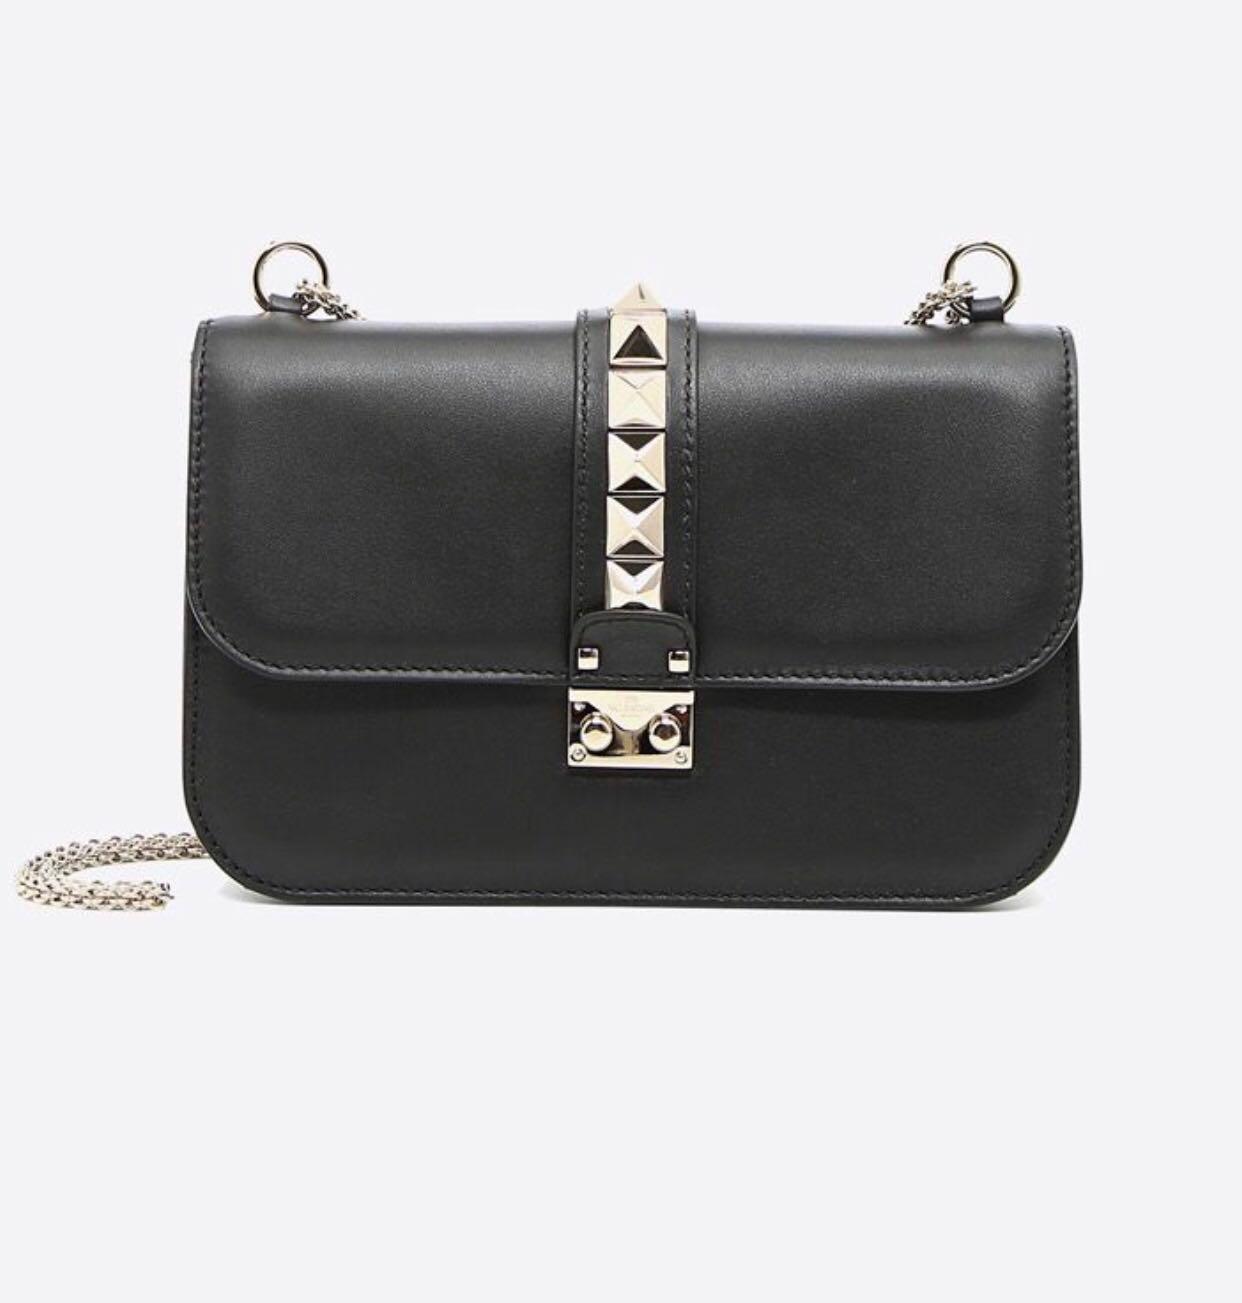 5dbae589a83 Valentino rockstud bag Medium ( Fast deal $1900), Women's Fashion ...